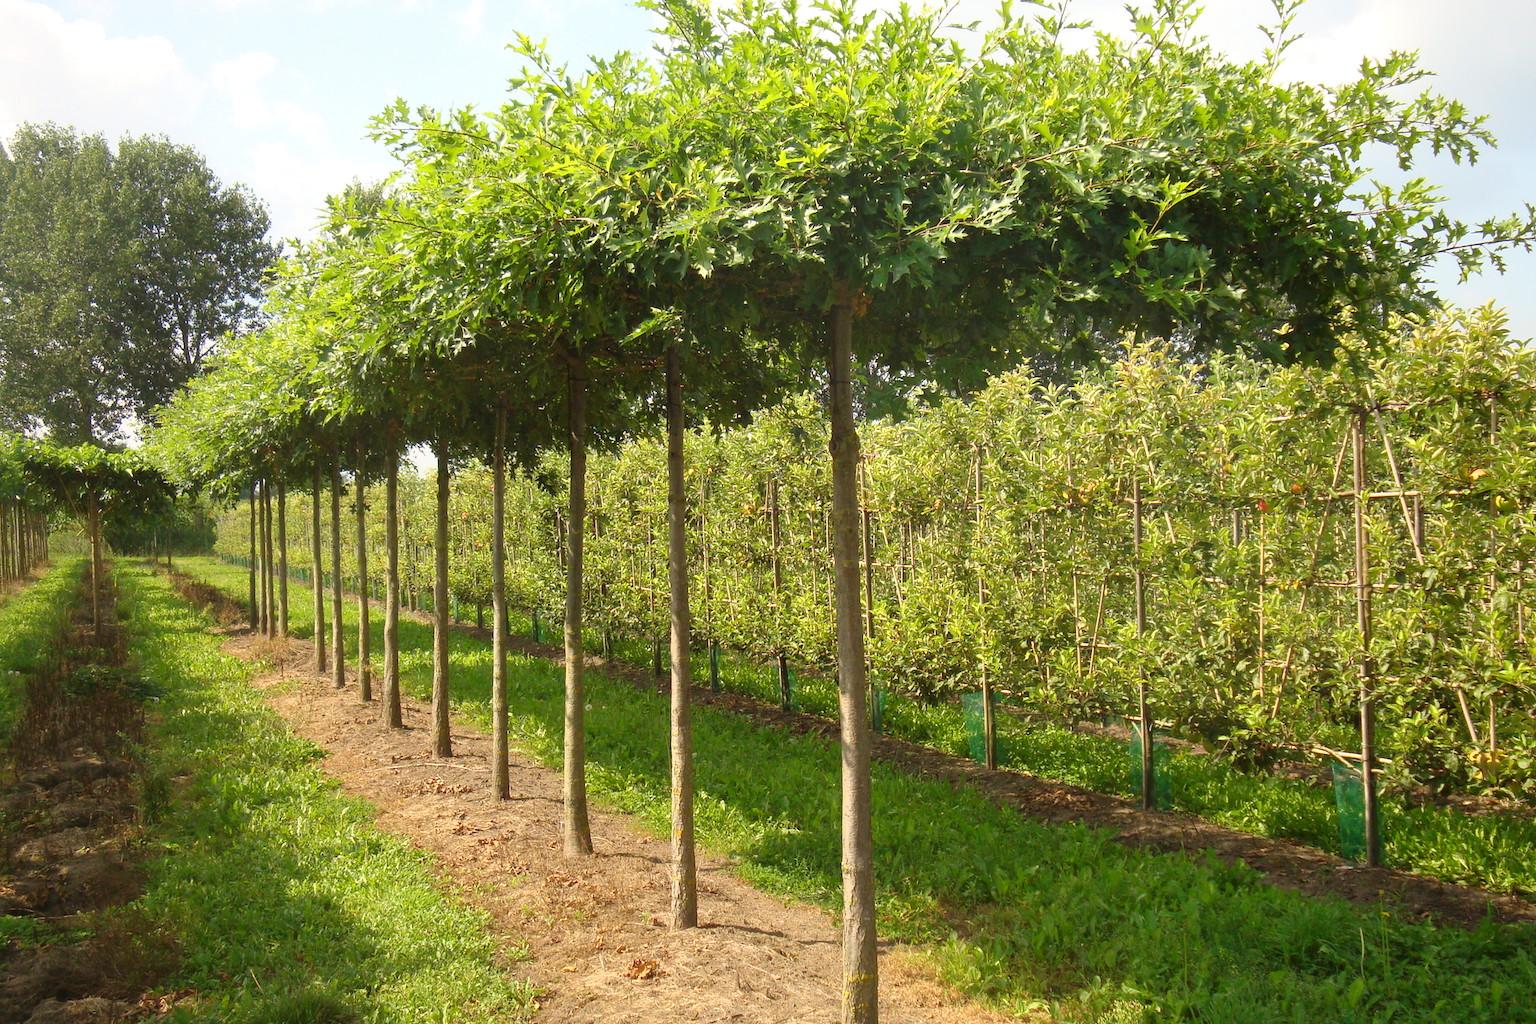 Quercus palustris (Pin Oak) roof form trees 20-25 grade